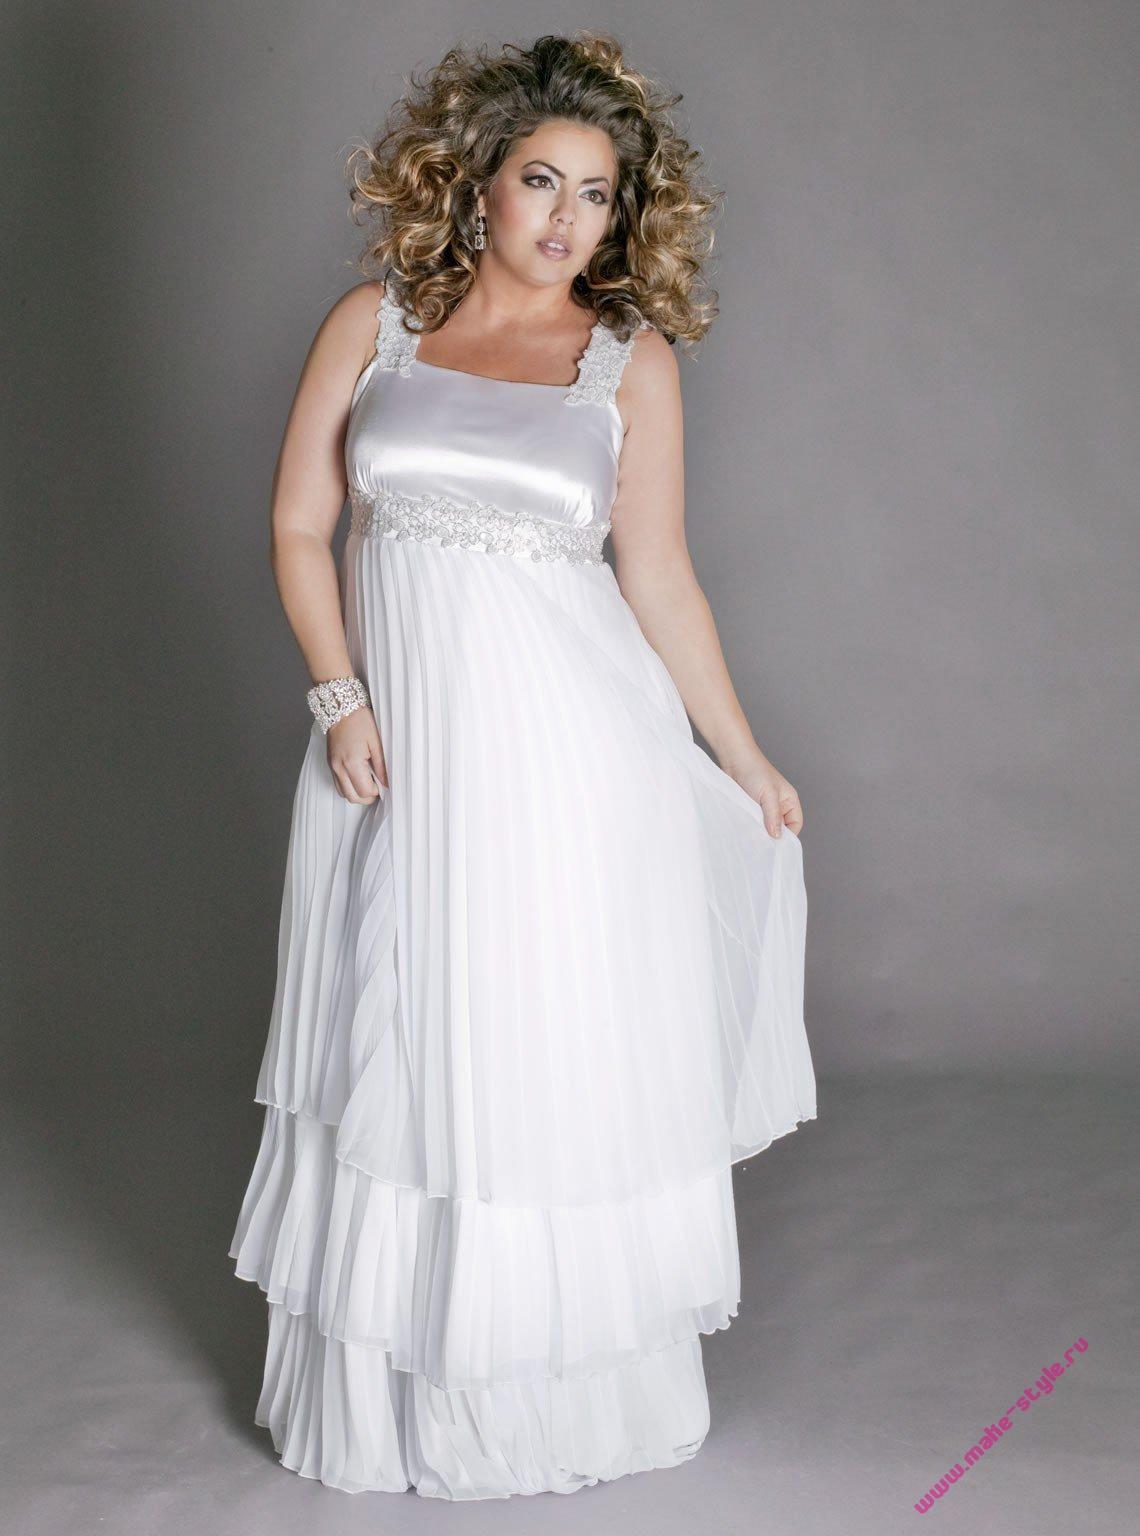 wedding dresses for fat women photo - 1